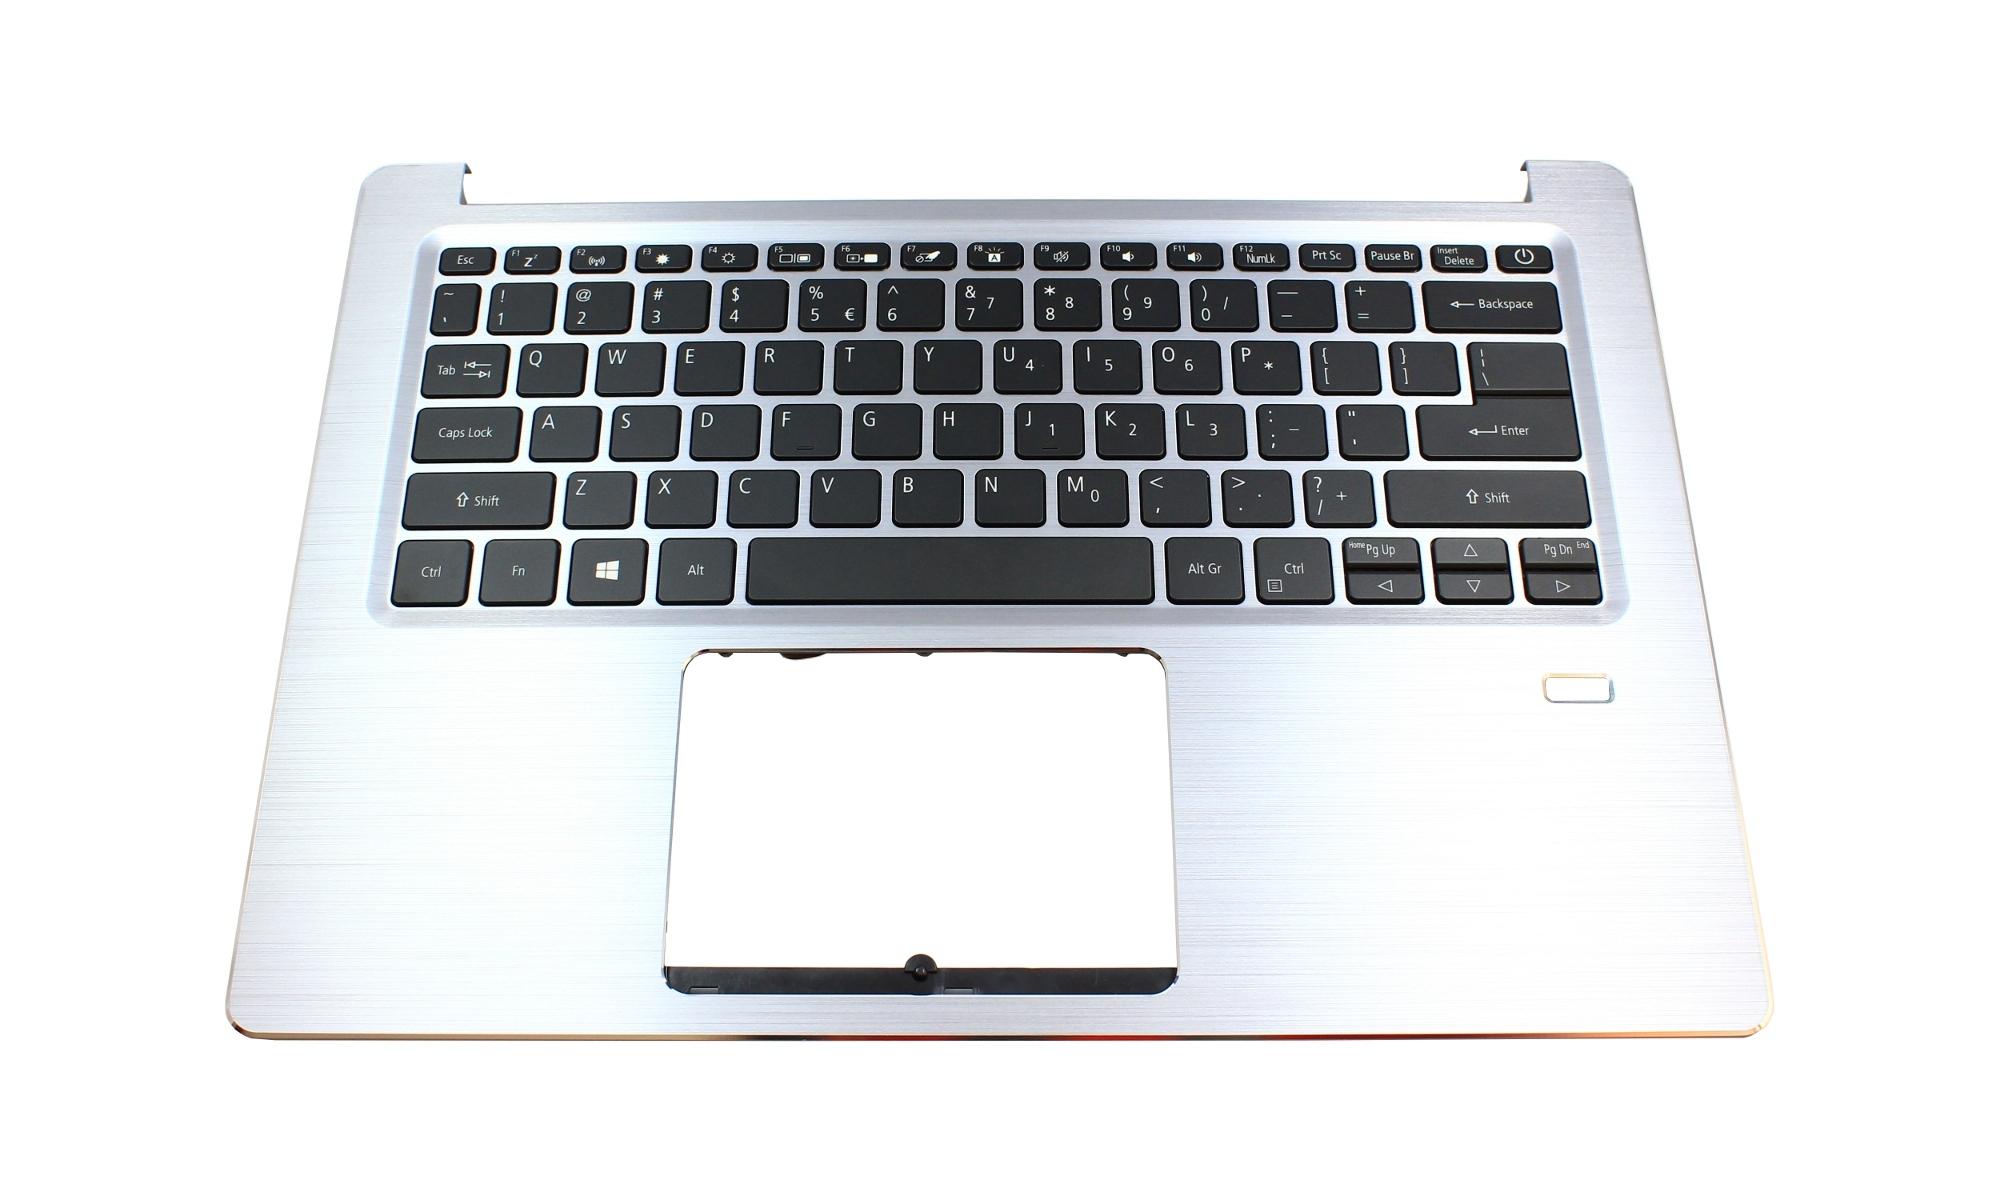 Carcasa superioara si tastatura originala Acer Swift 3 SF314-54, cu iluminare